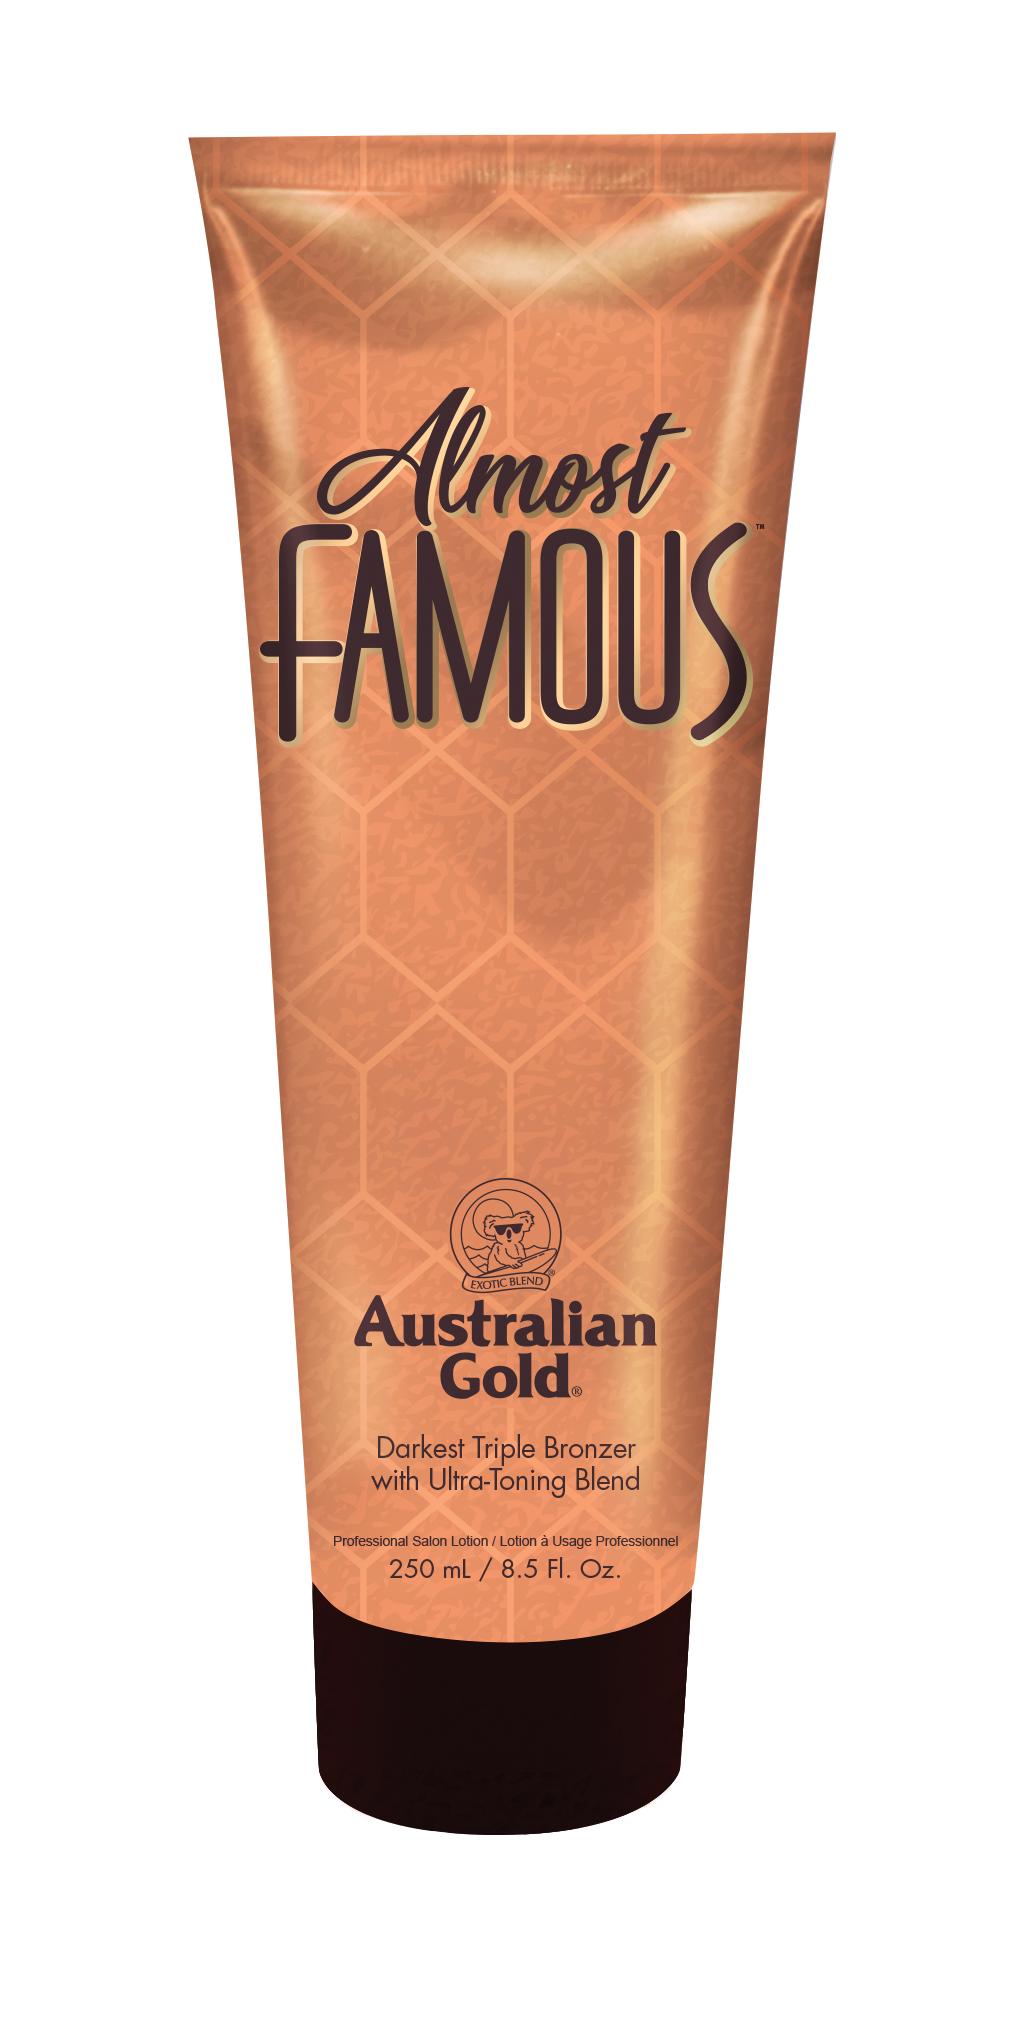 Australian Gold - Almost Famous Bronzer 250 ml